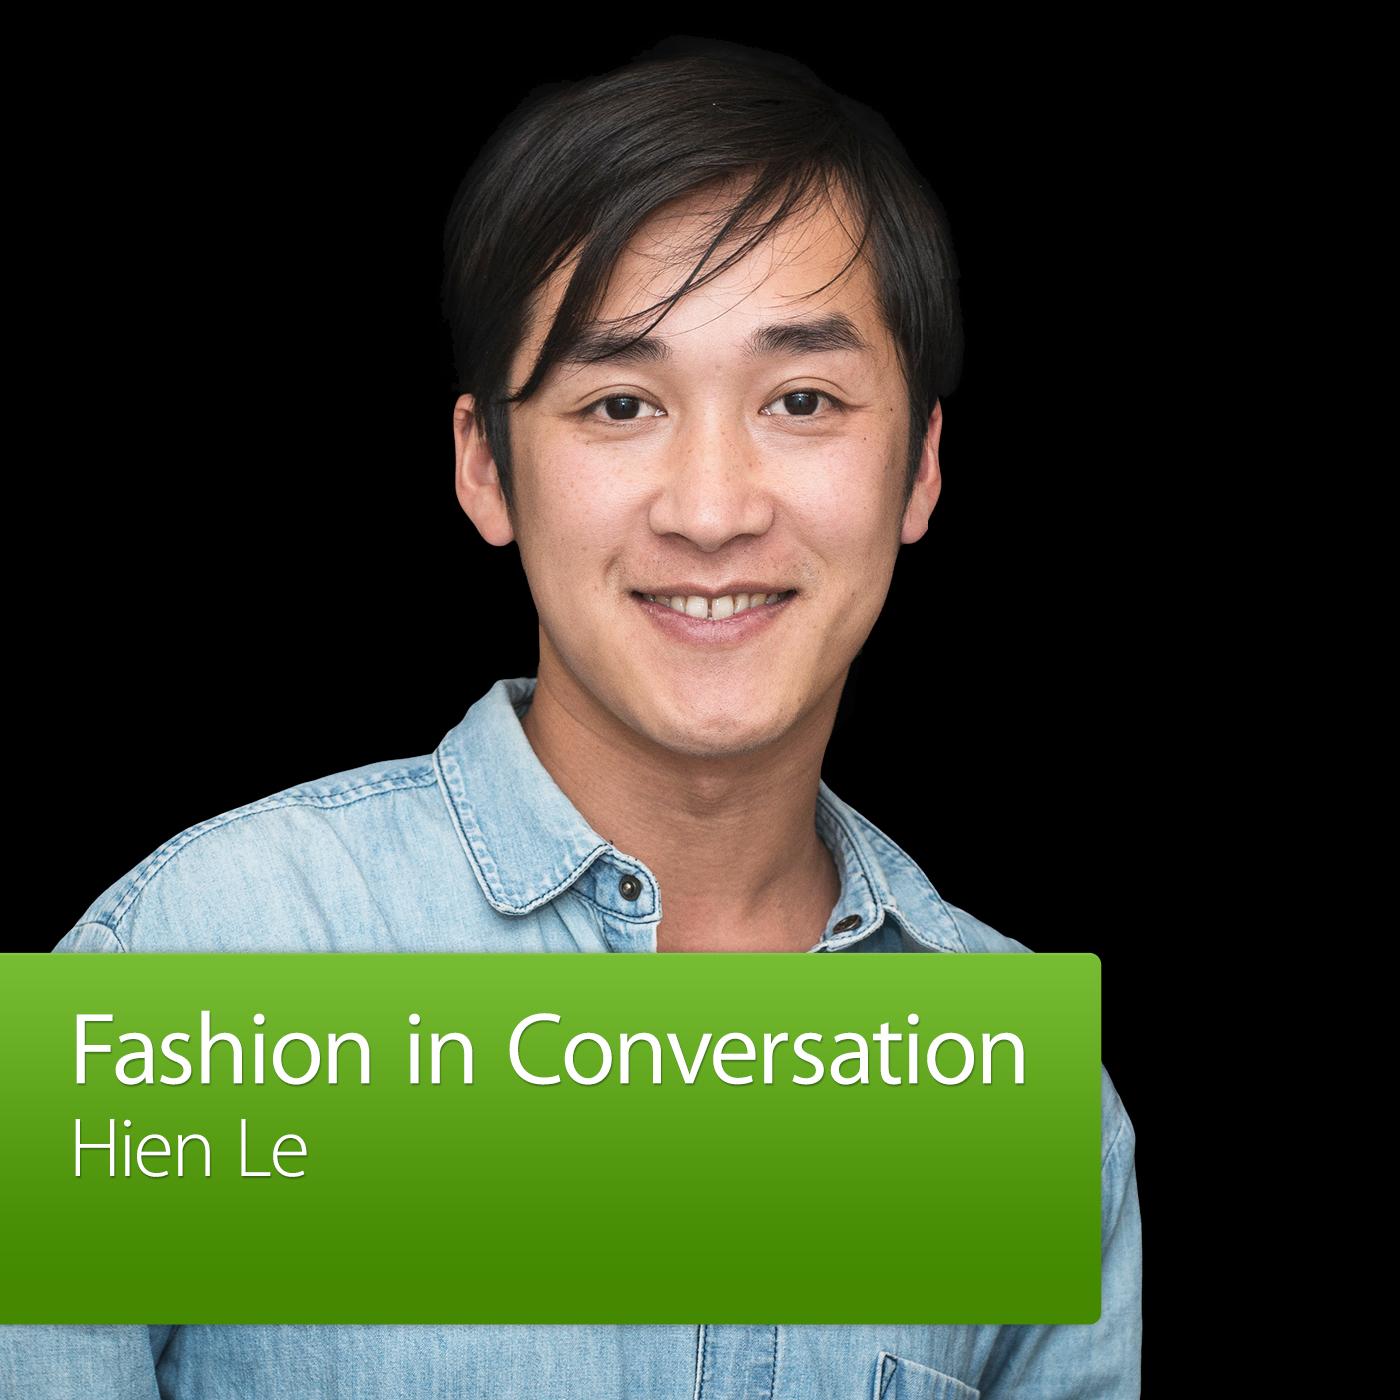 Hien Le: Fashion in Conversation